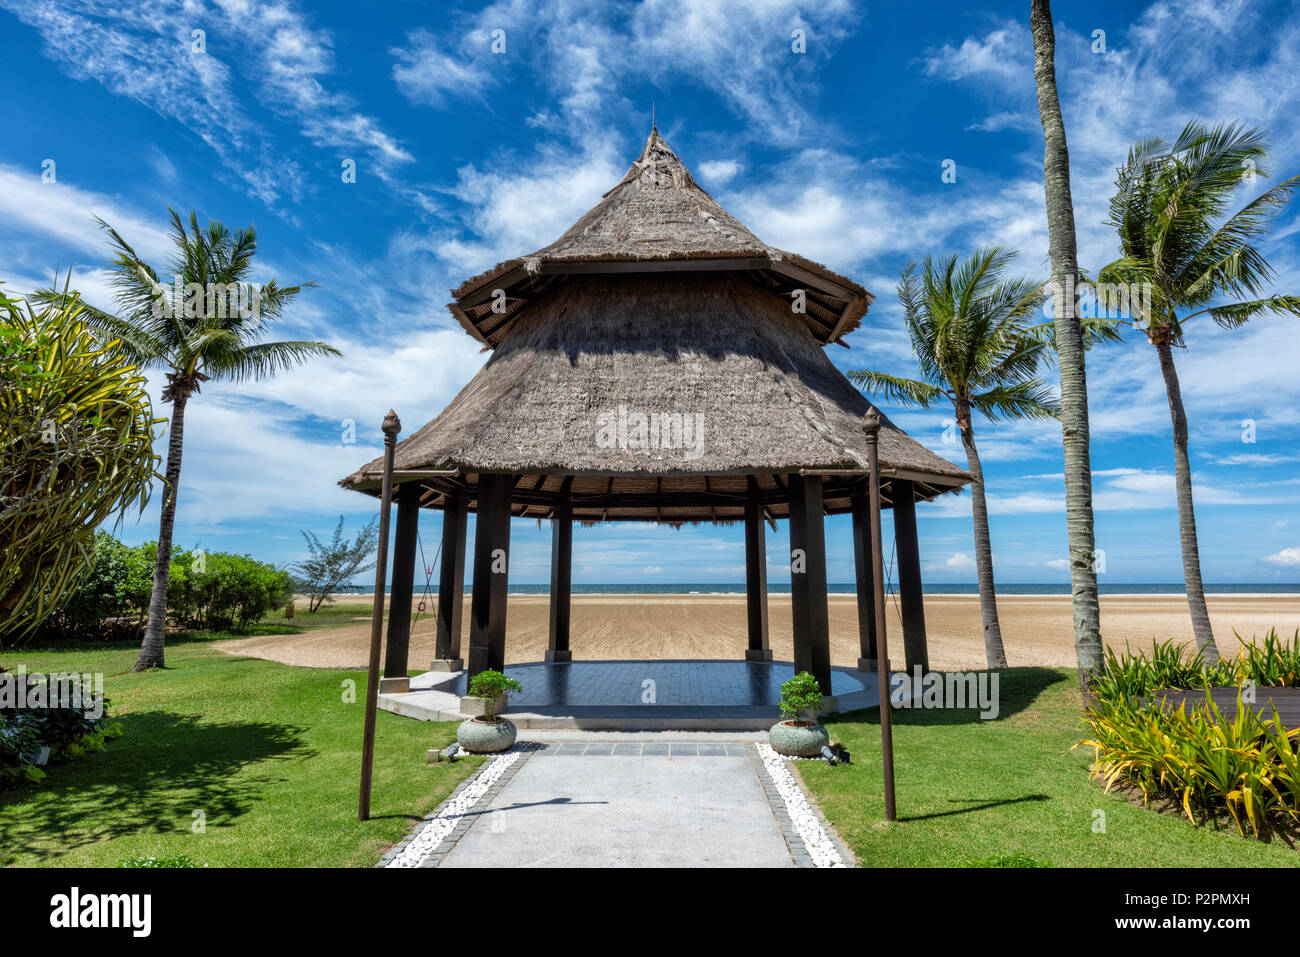 Pavillon im Boden der Shangri La Rasa Ria Hotel Kota Kinabalu, Borneo, Malaysia Stockbild